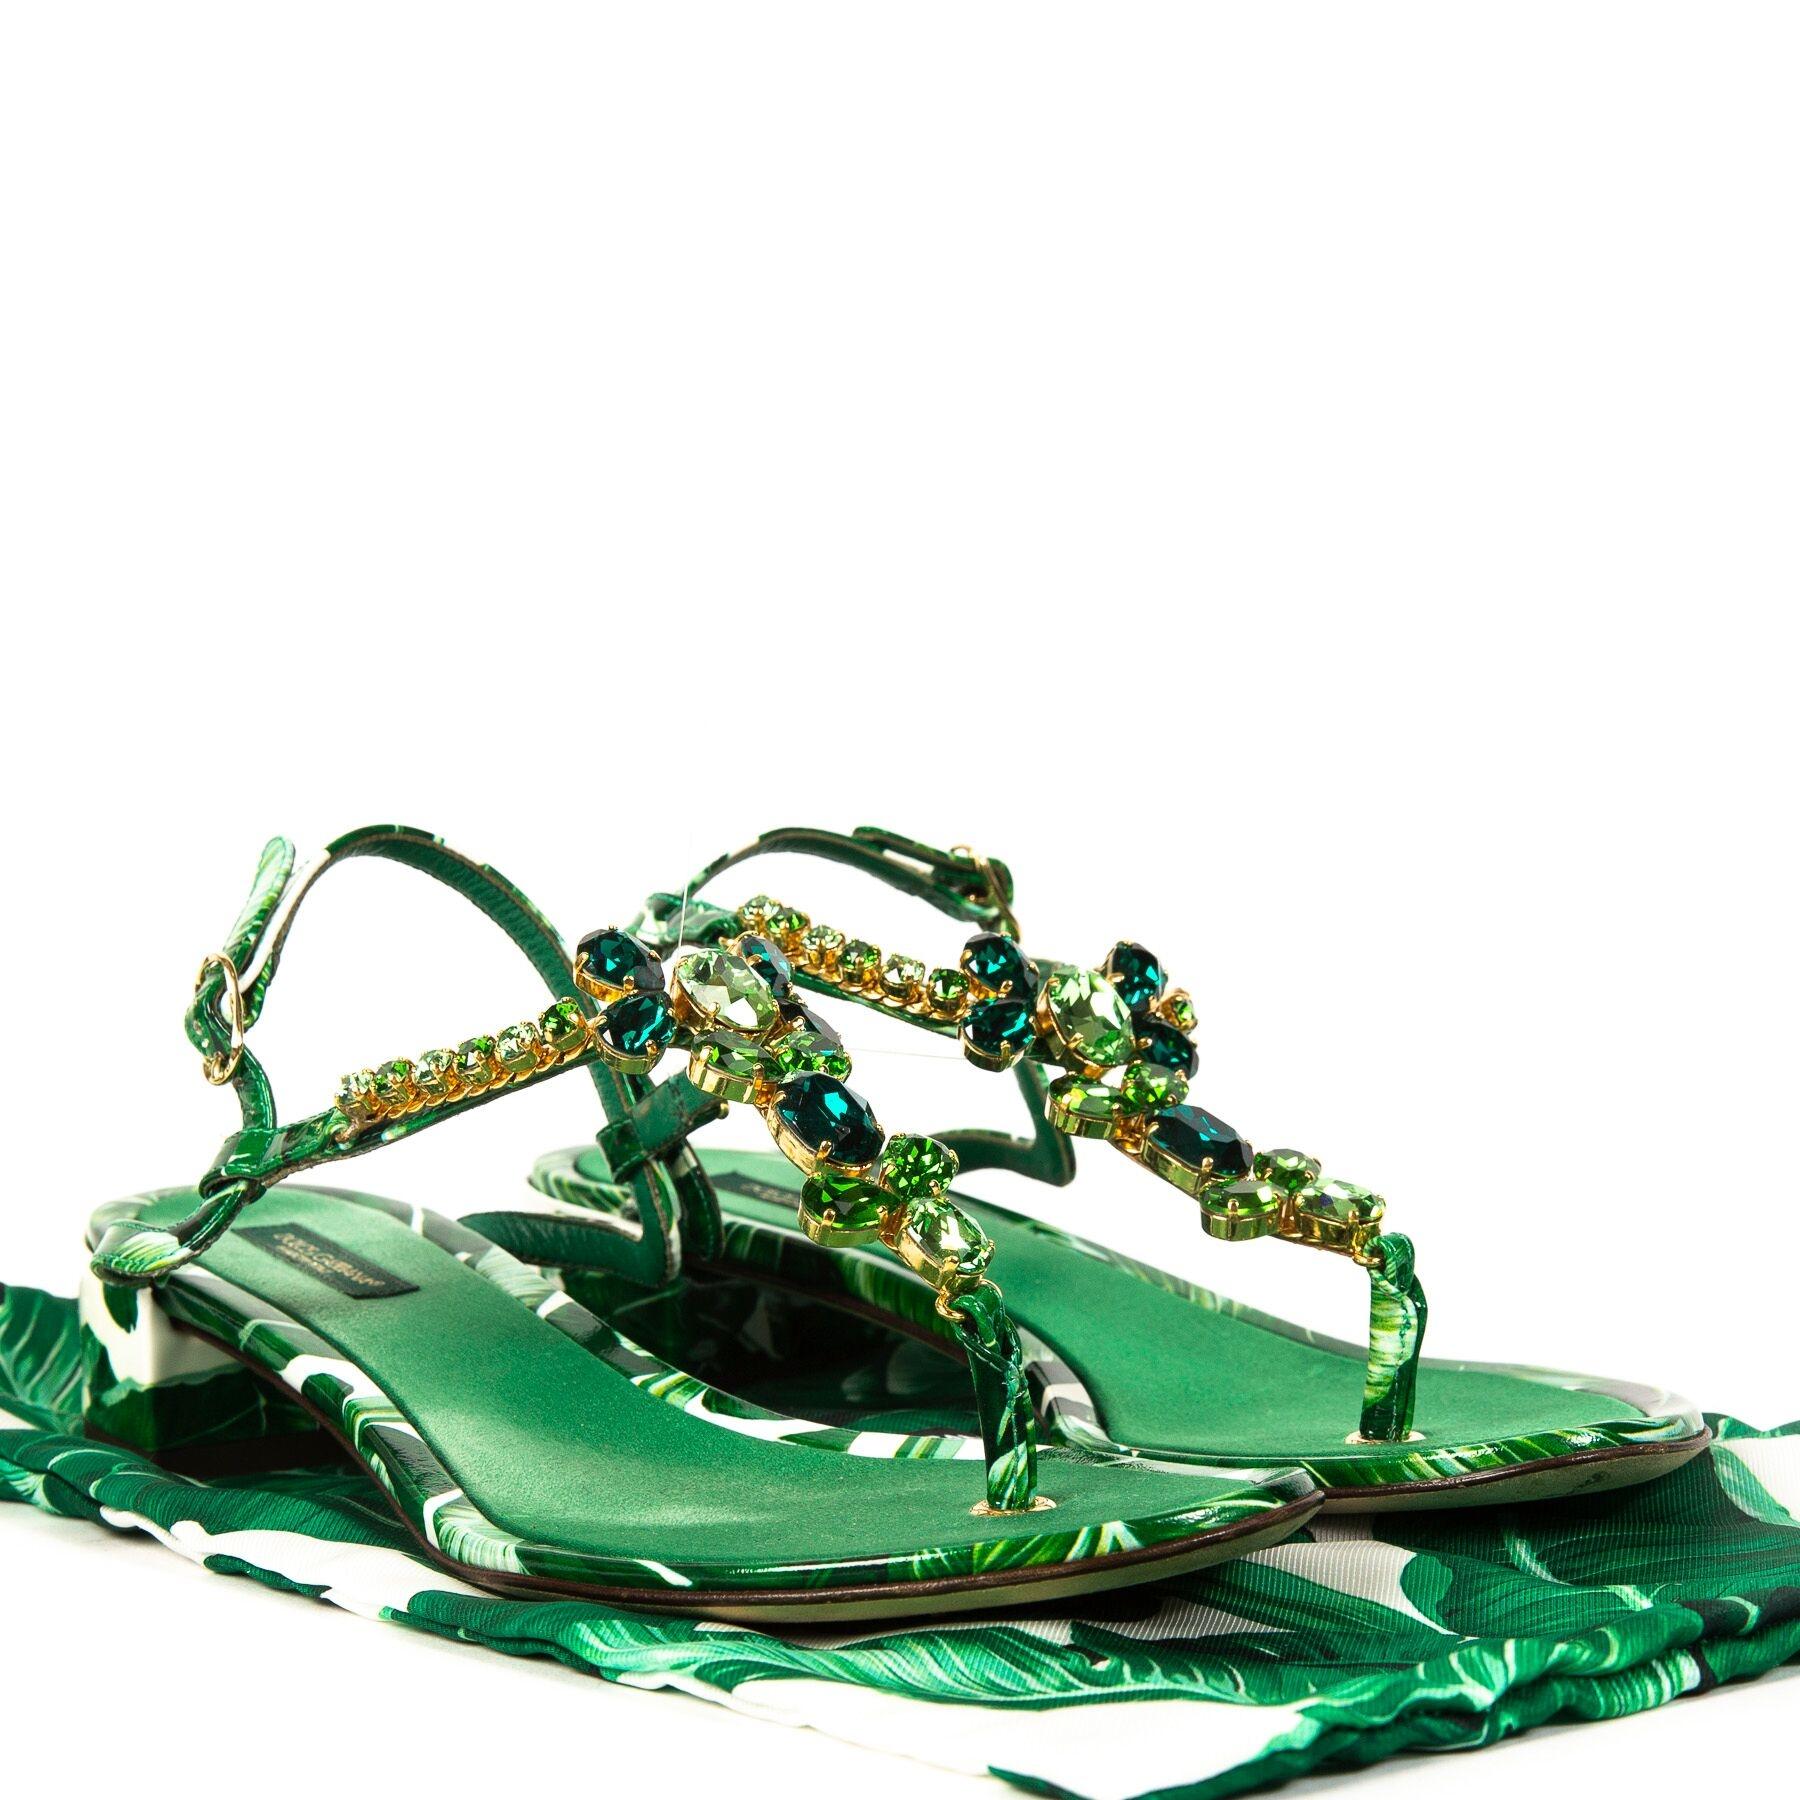 acheter en ligne Dolce & Gabbana Green Banana Leaf T Strap Sandals - Size 38.